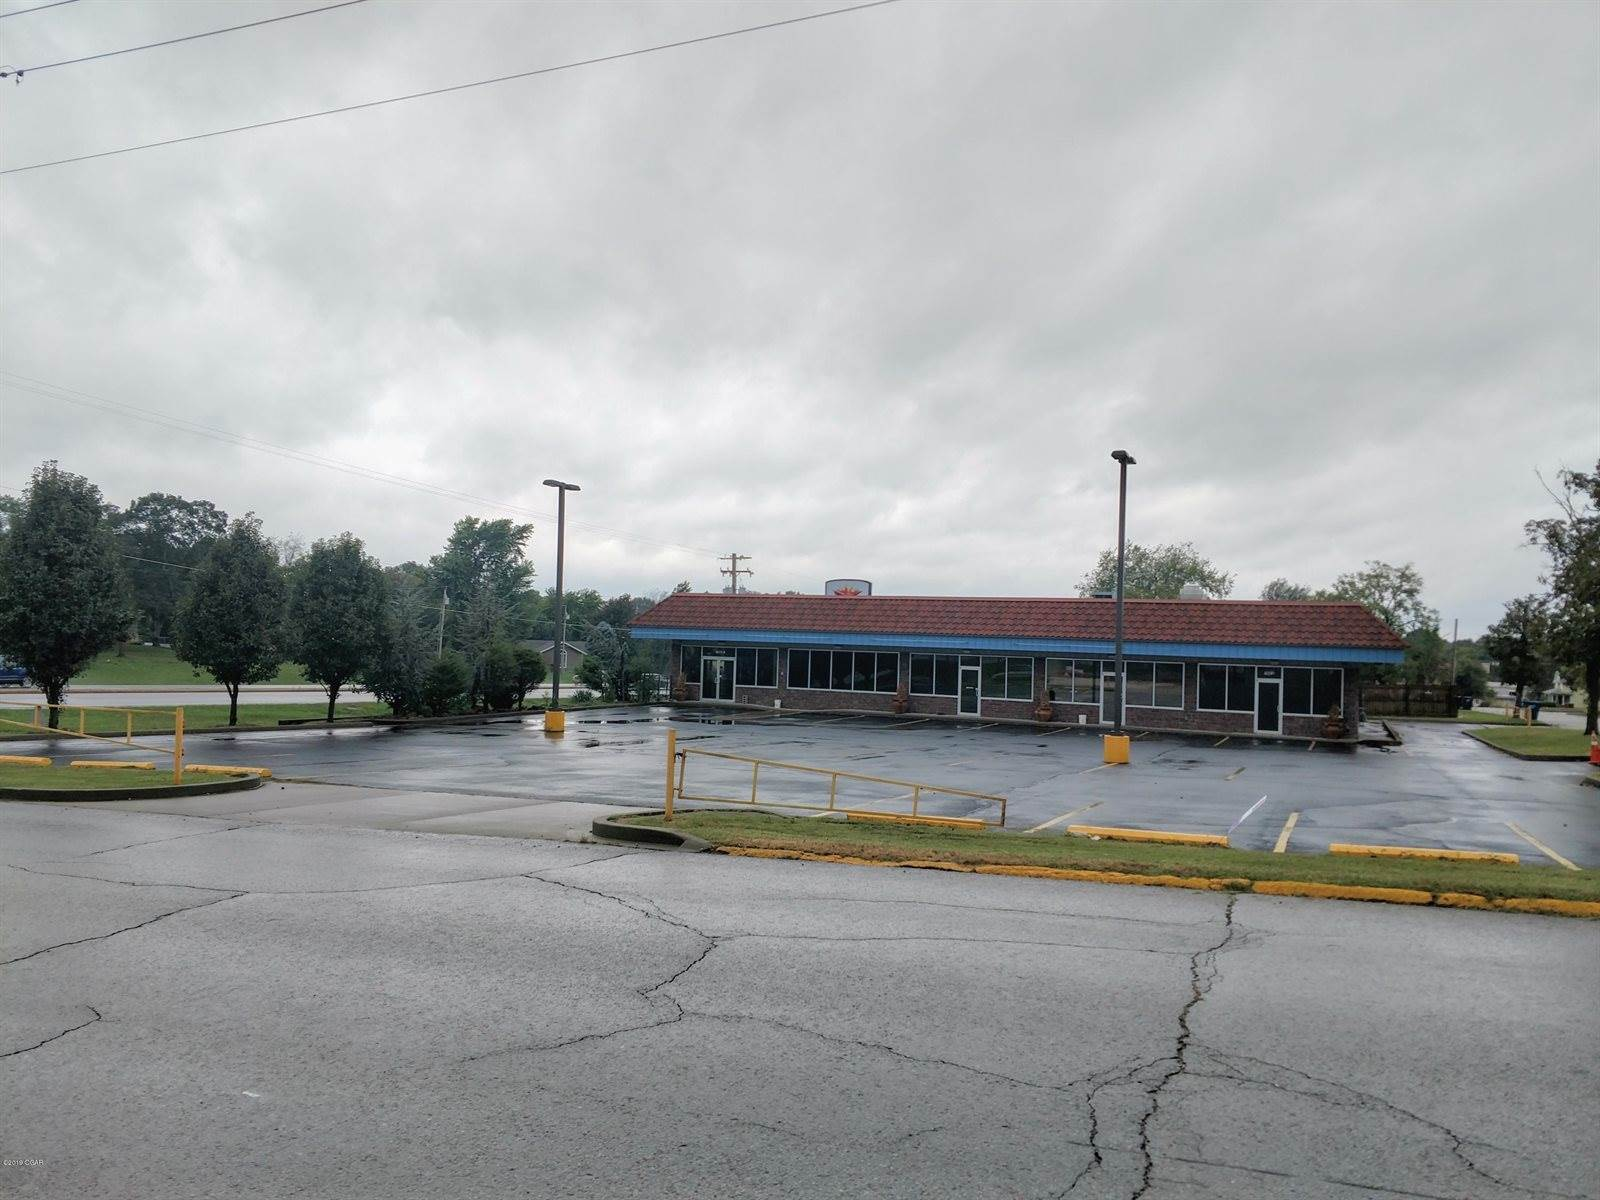 708 West 4th Street, Webb City, MO 64870